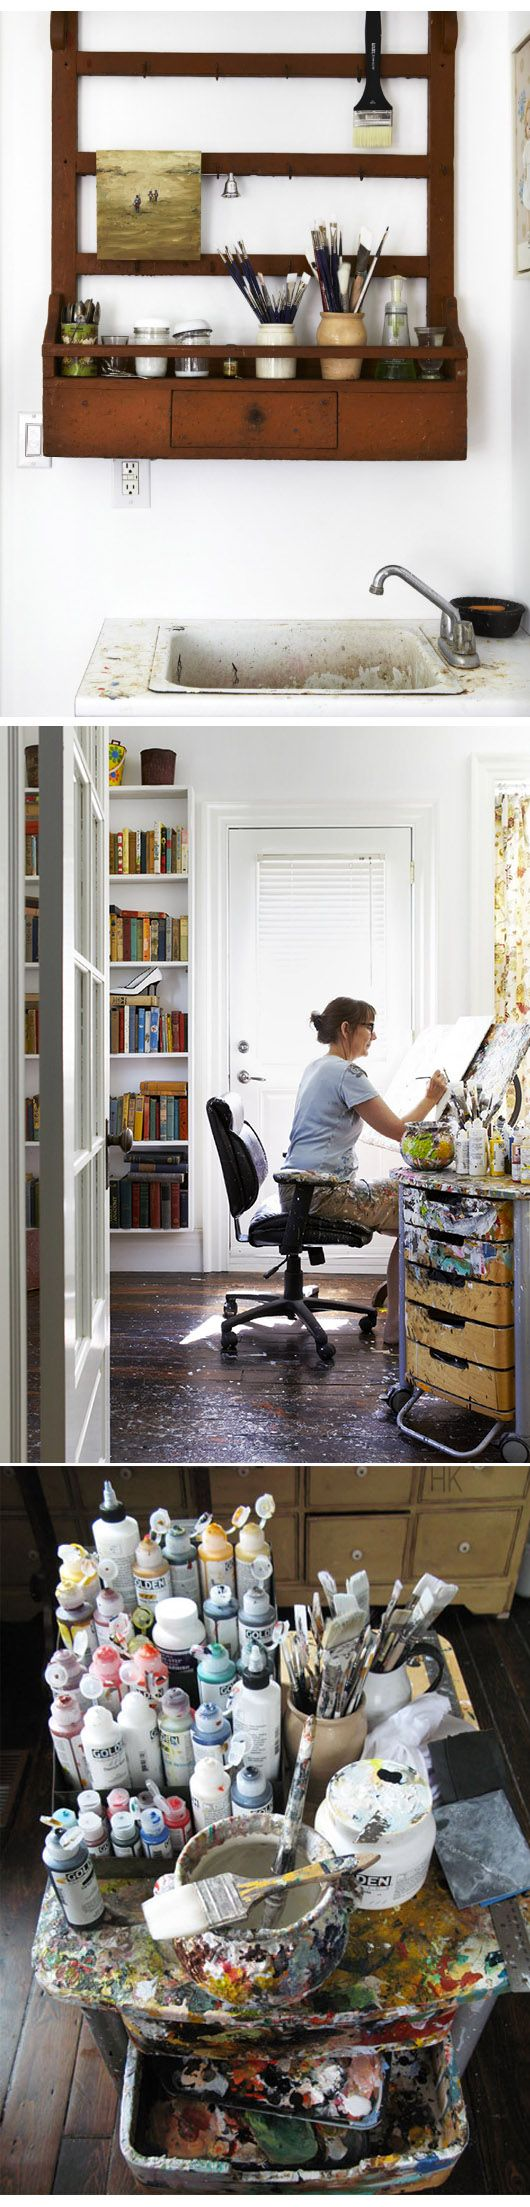 Holly Farrell #workspace #studio http://www.hollyfarrell.com/